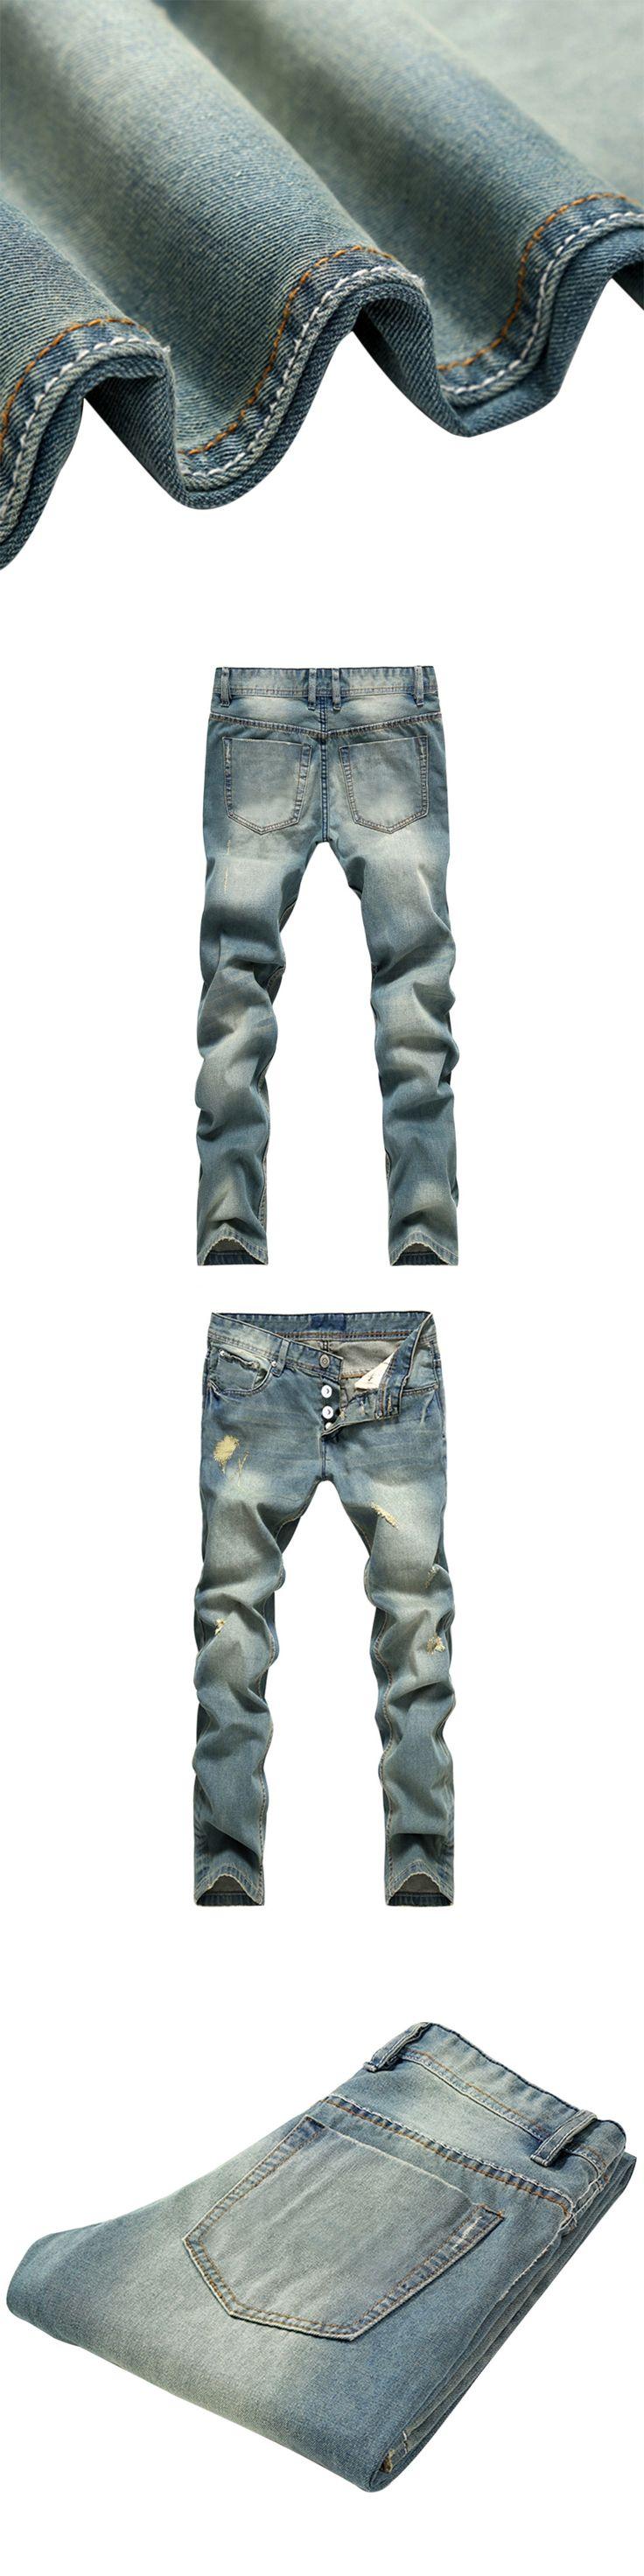 Autumn 2017 New Men's Modern Harem Jeans Slim Pencil Pants For Youth Fashion Cross-Pants  Men Patchwork Hole Denim Skinny